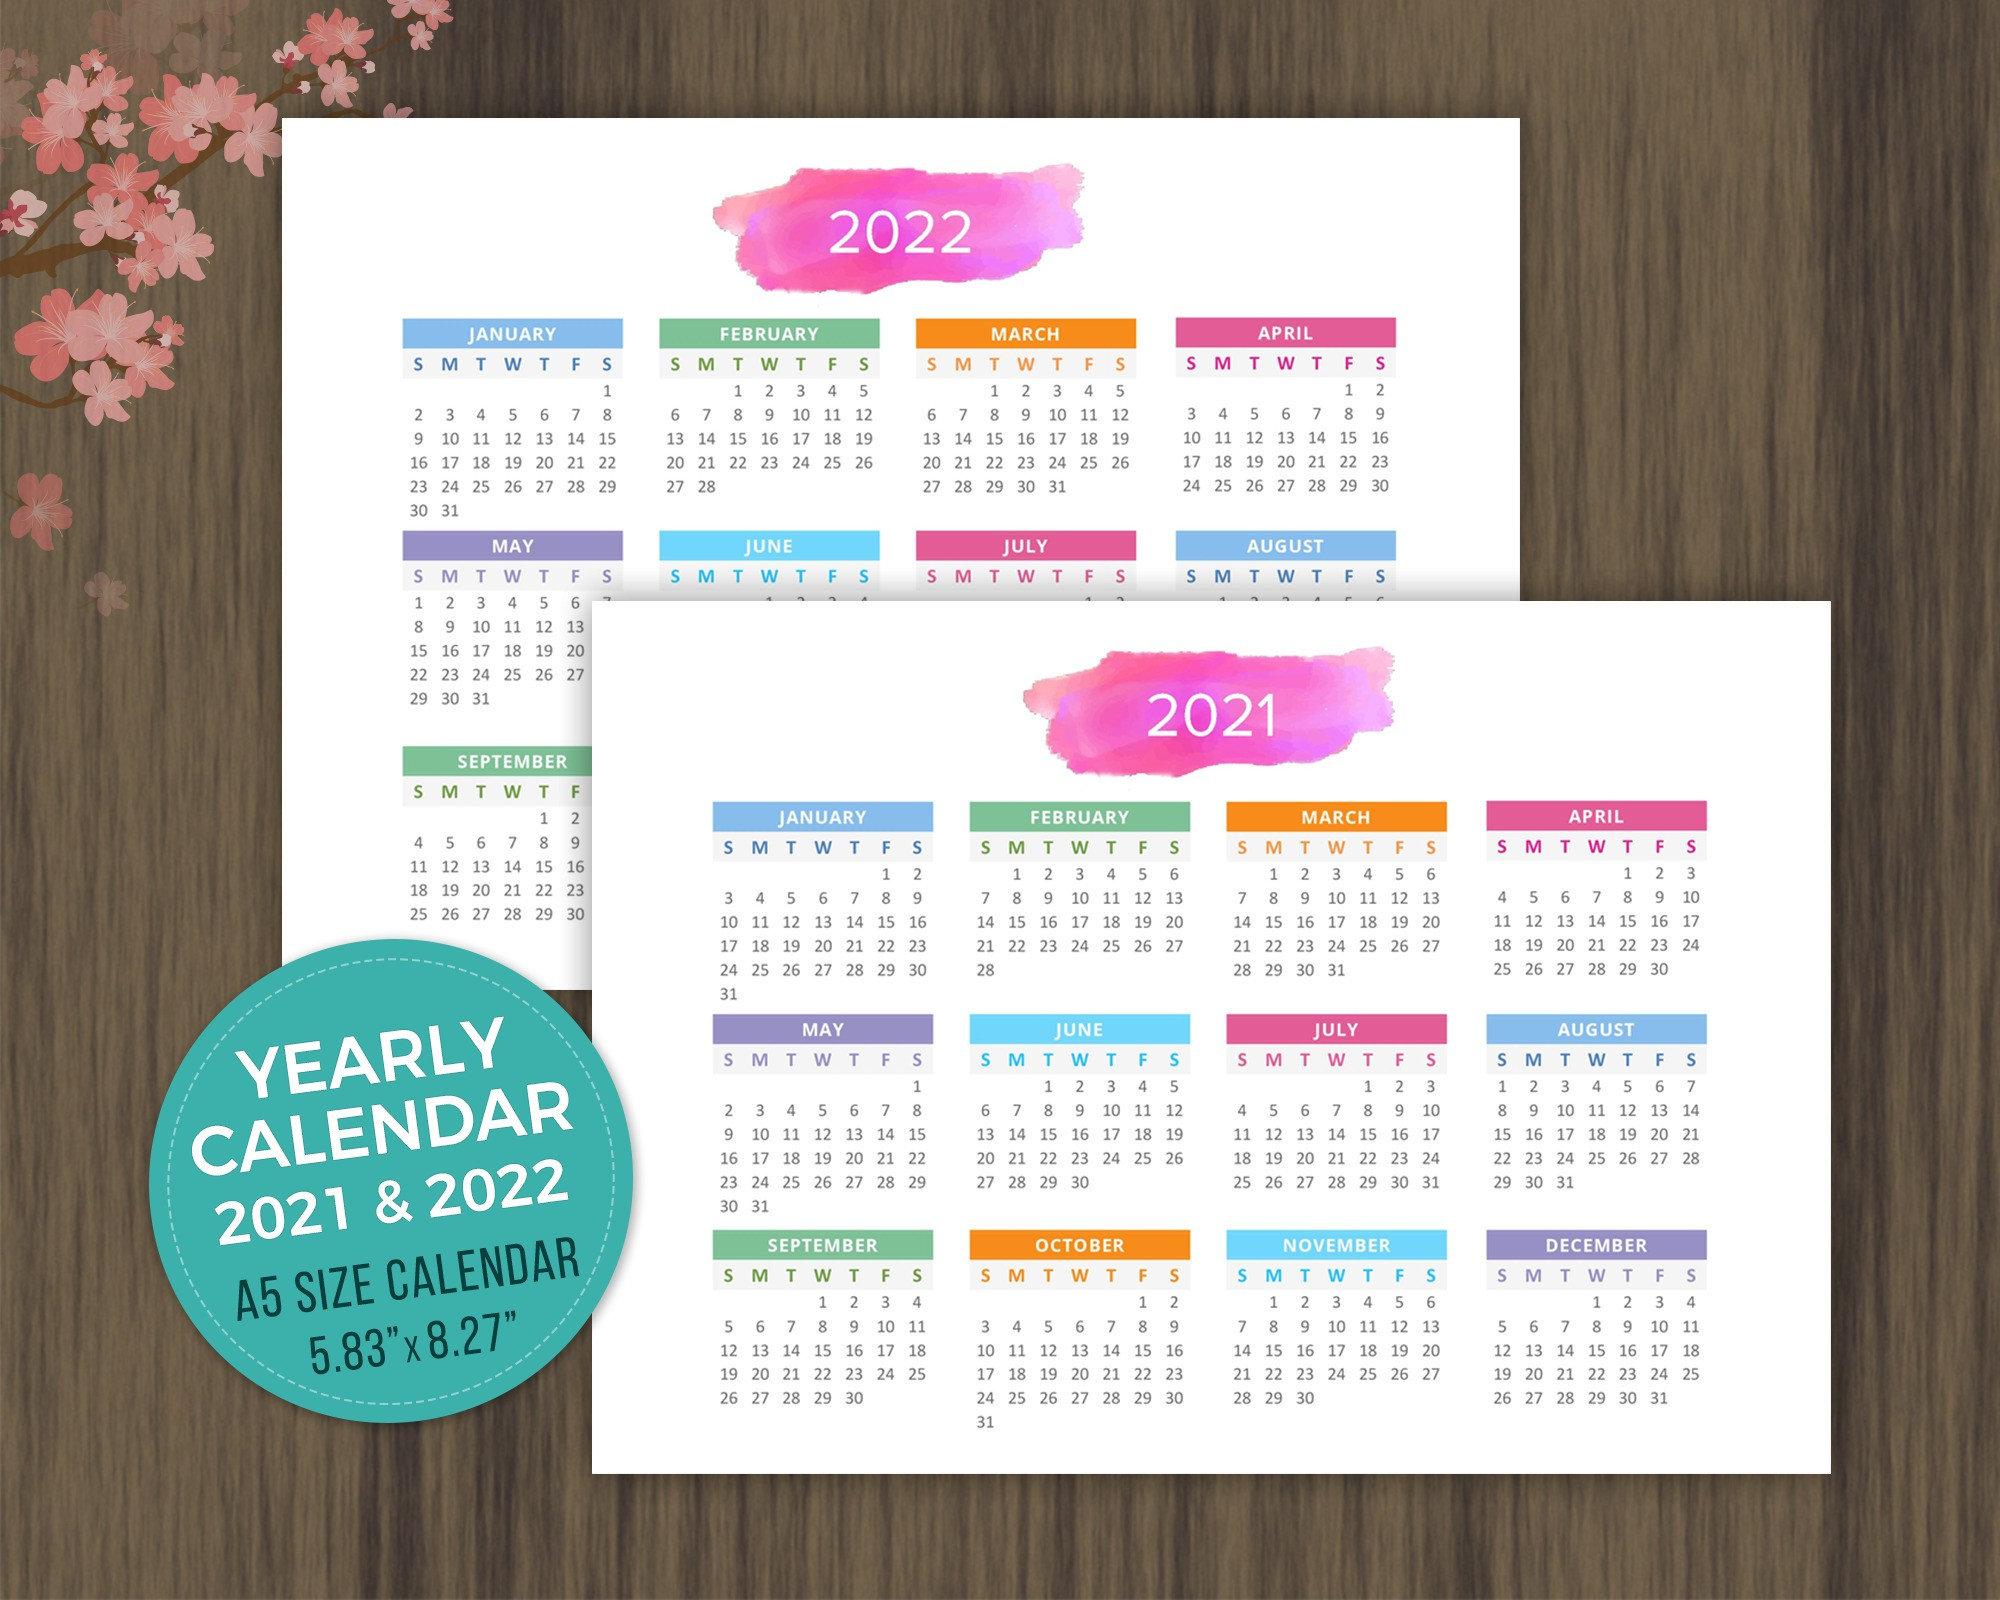 A5 Printable Calendar 2021 2022 Desktop Calendar Landscape Etsy